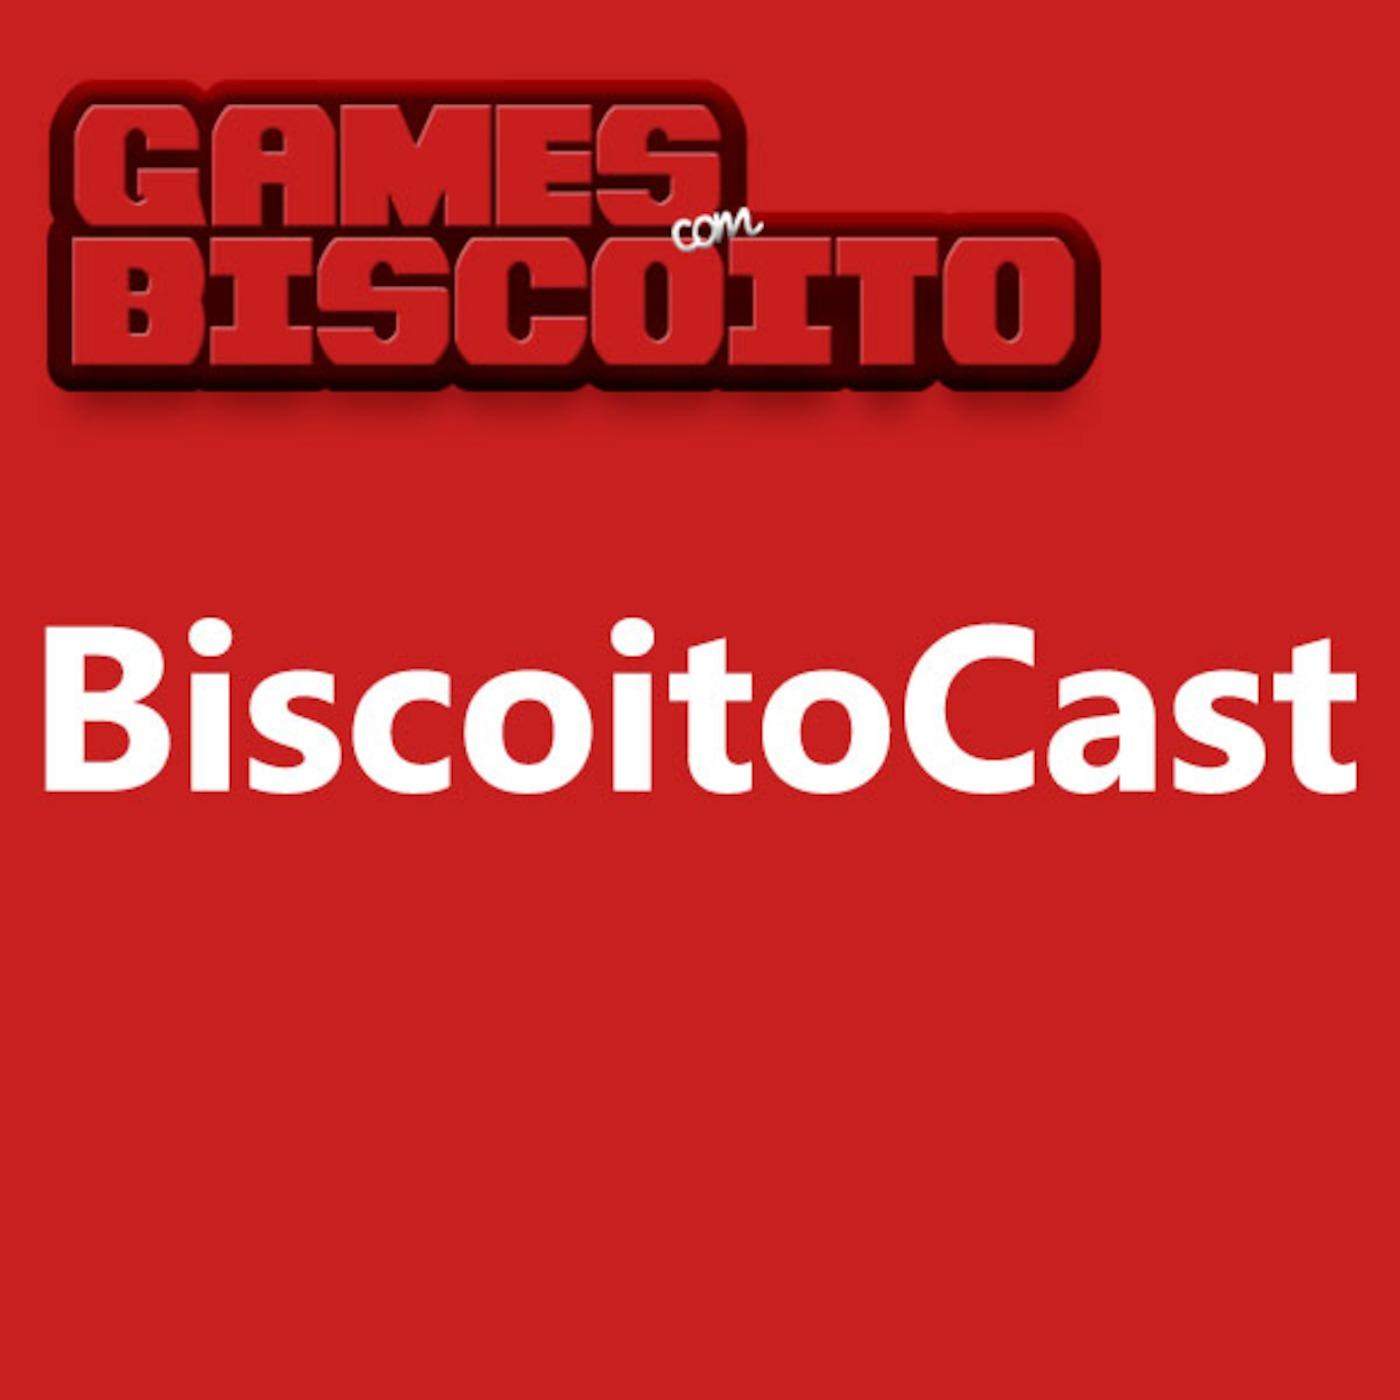 BiscoitoCast